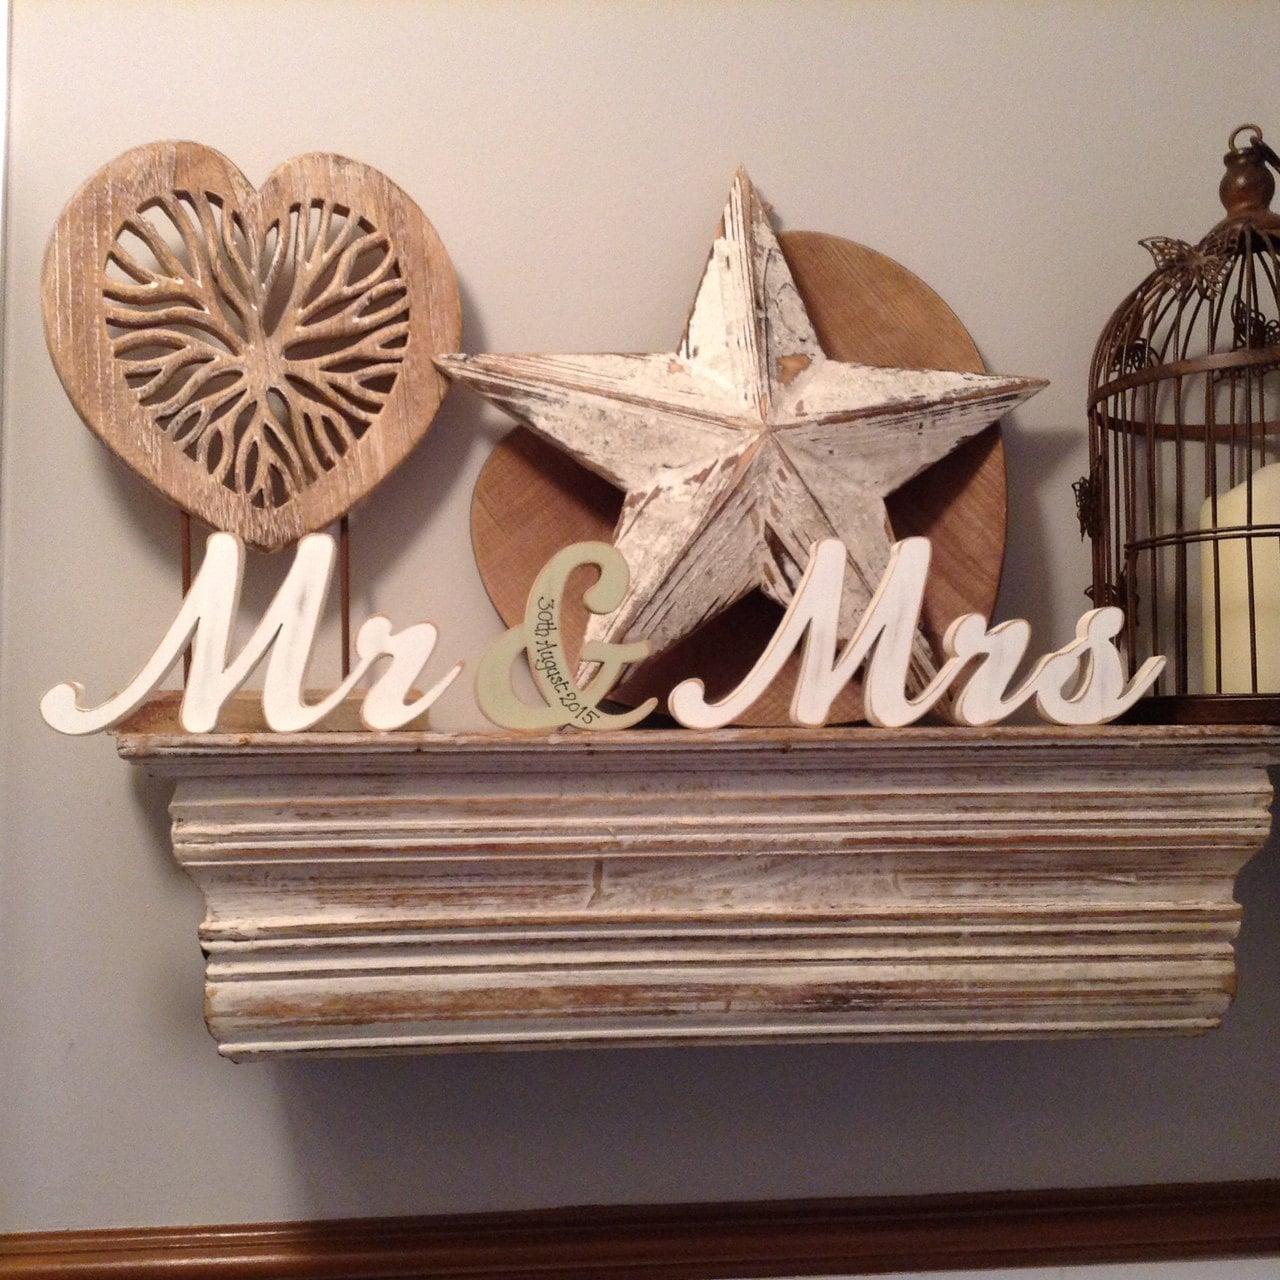 Wooden Wedding Letters - Mr & Mrs - Machiarge Font - 15cm - free